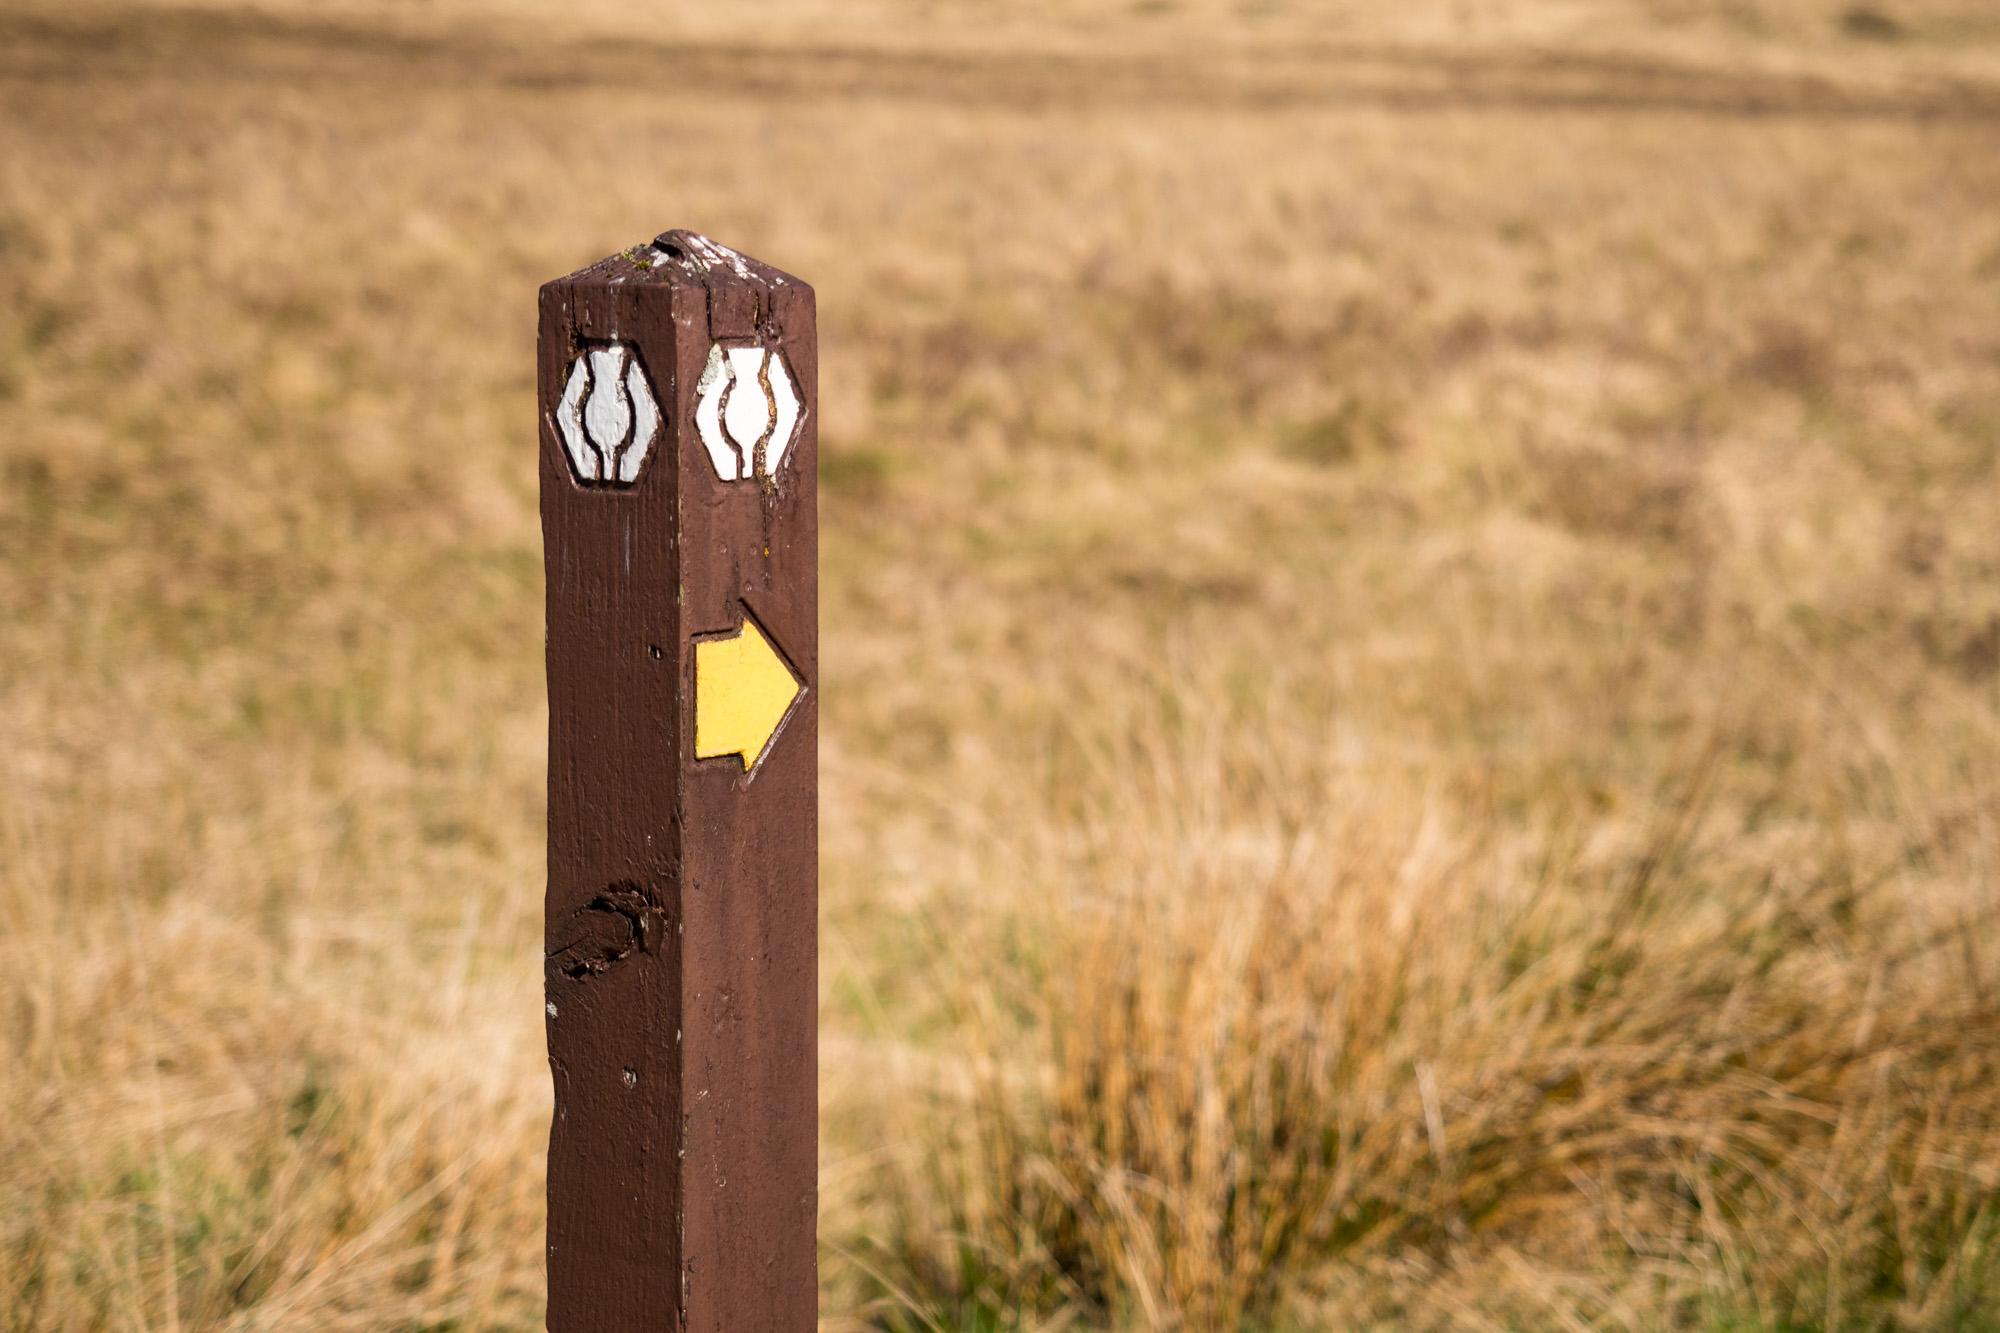 West Highland Way - Offizieller Wegweiser des West Highland Way